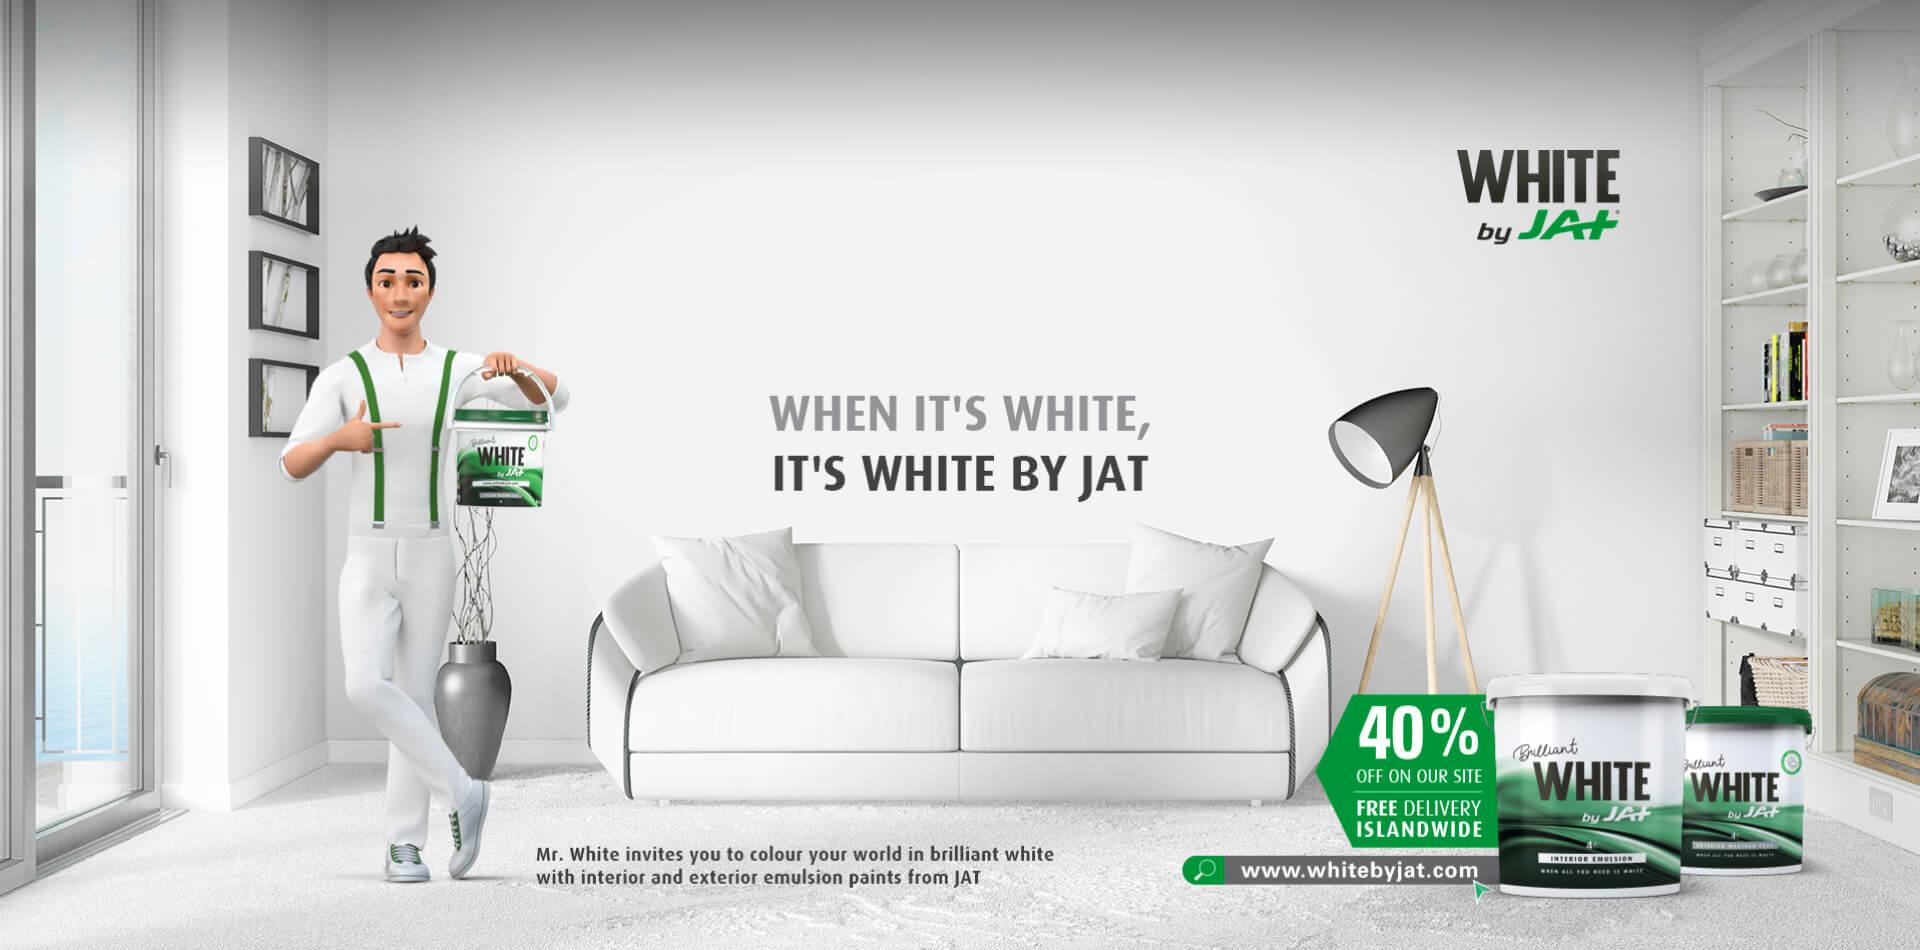 white-by-jat-img